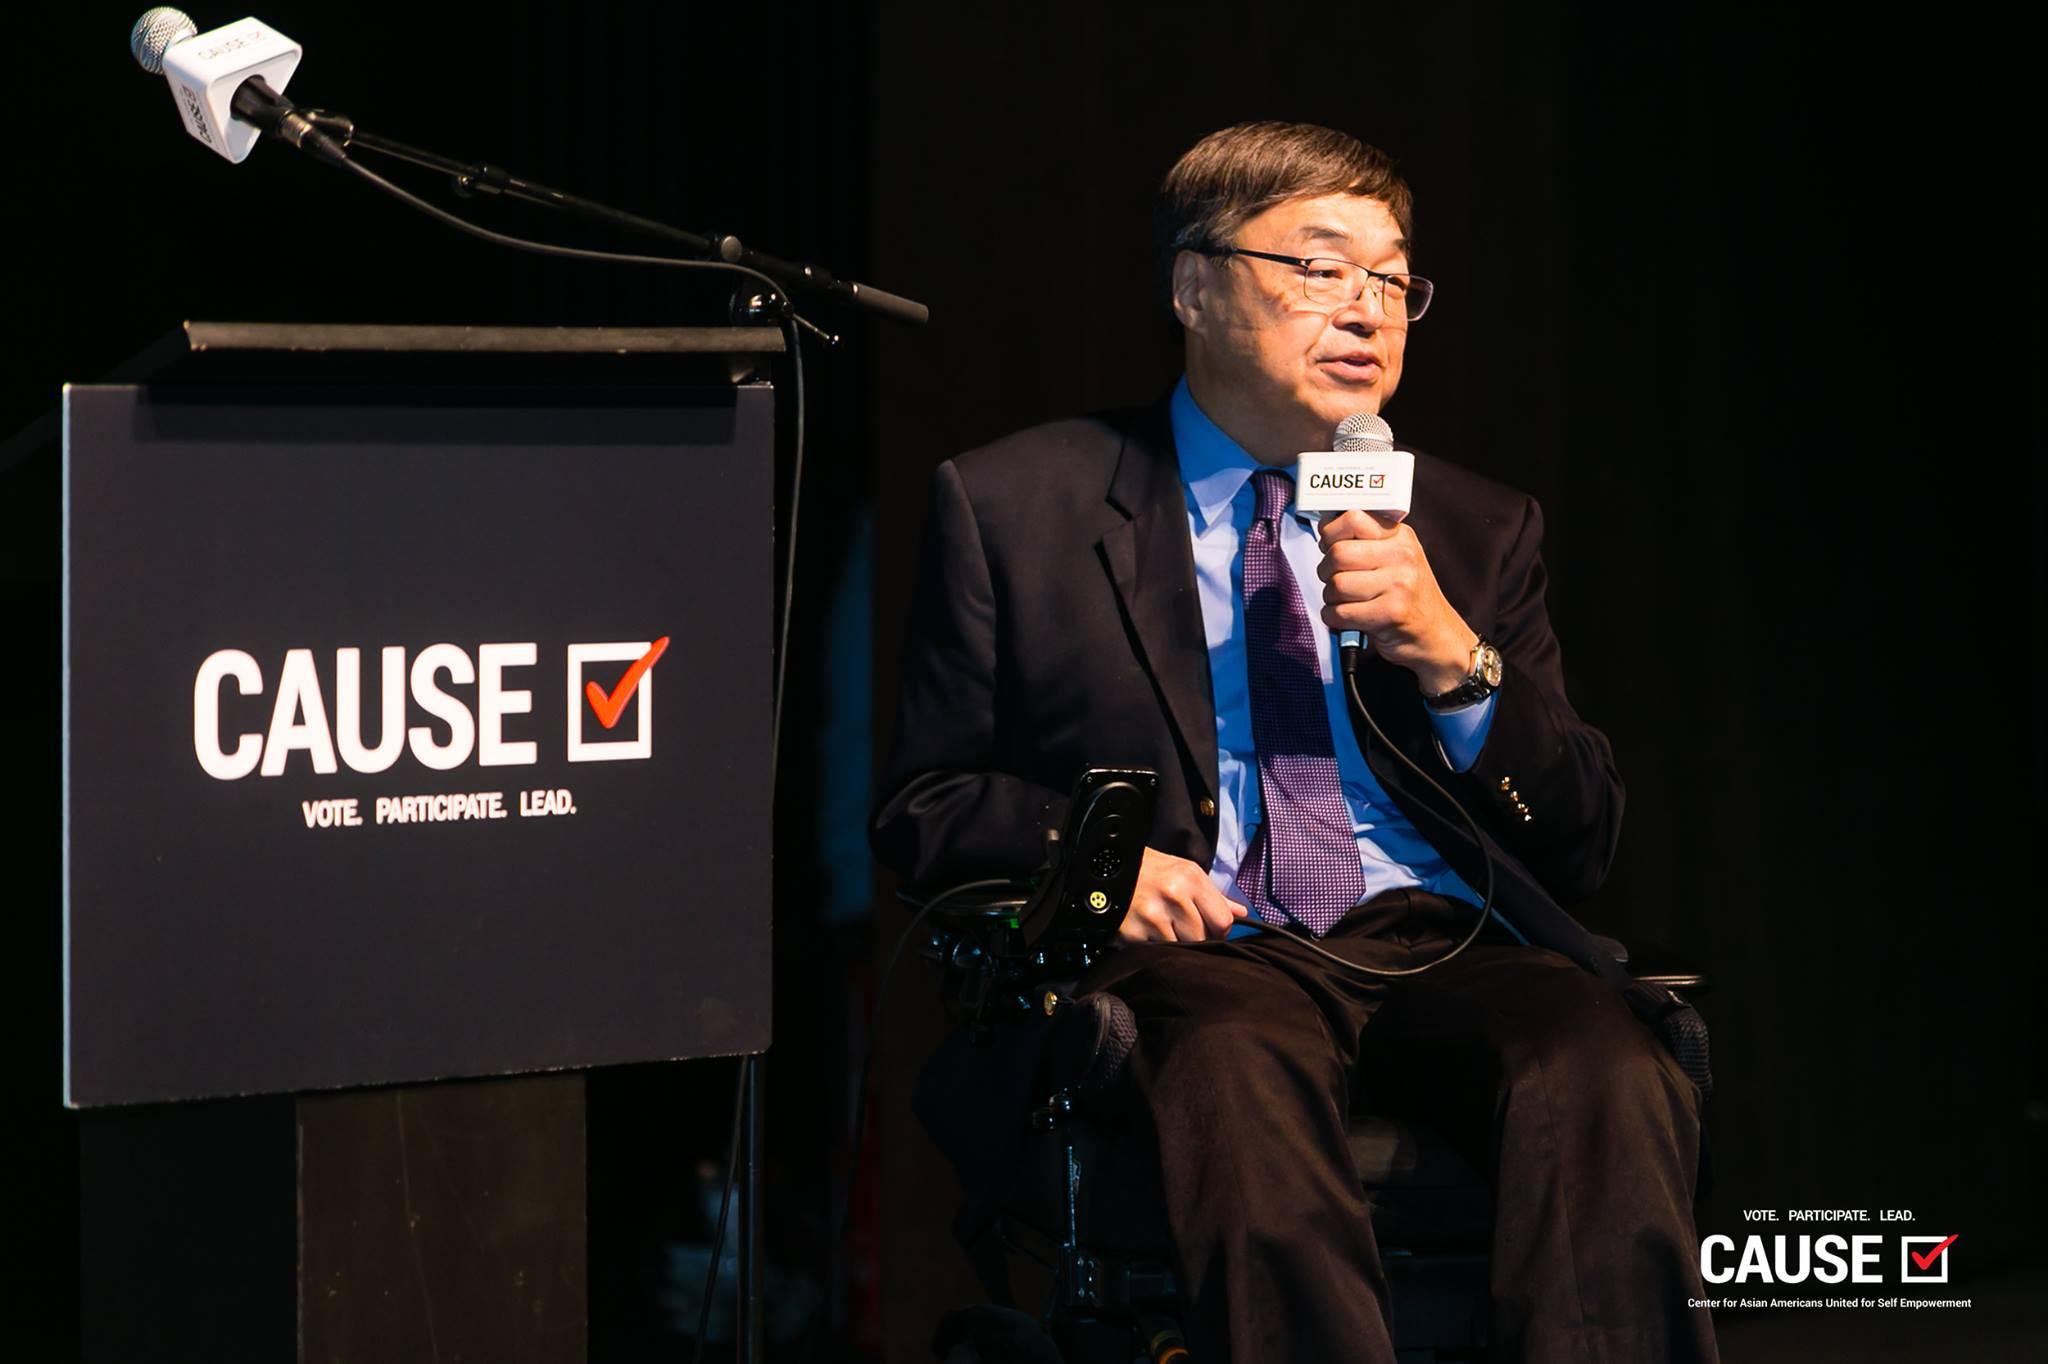 Charlie Woo speaking at the 2018 Leadership Academy Graduation